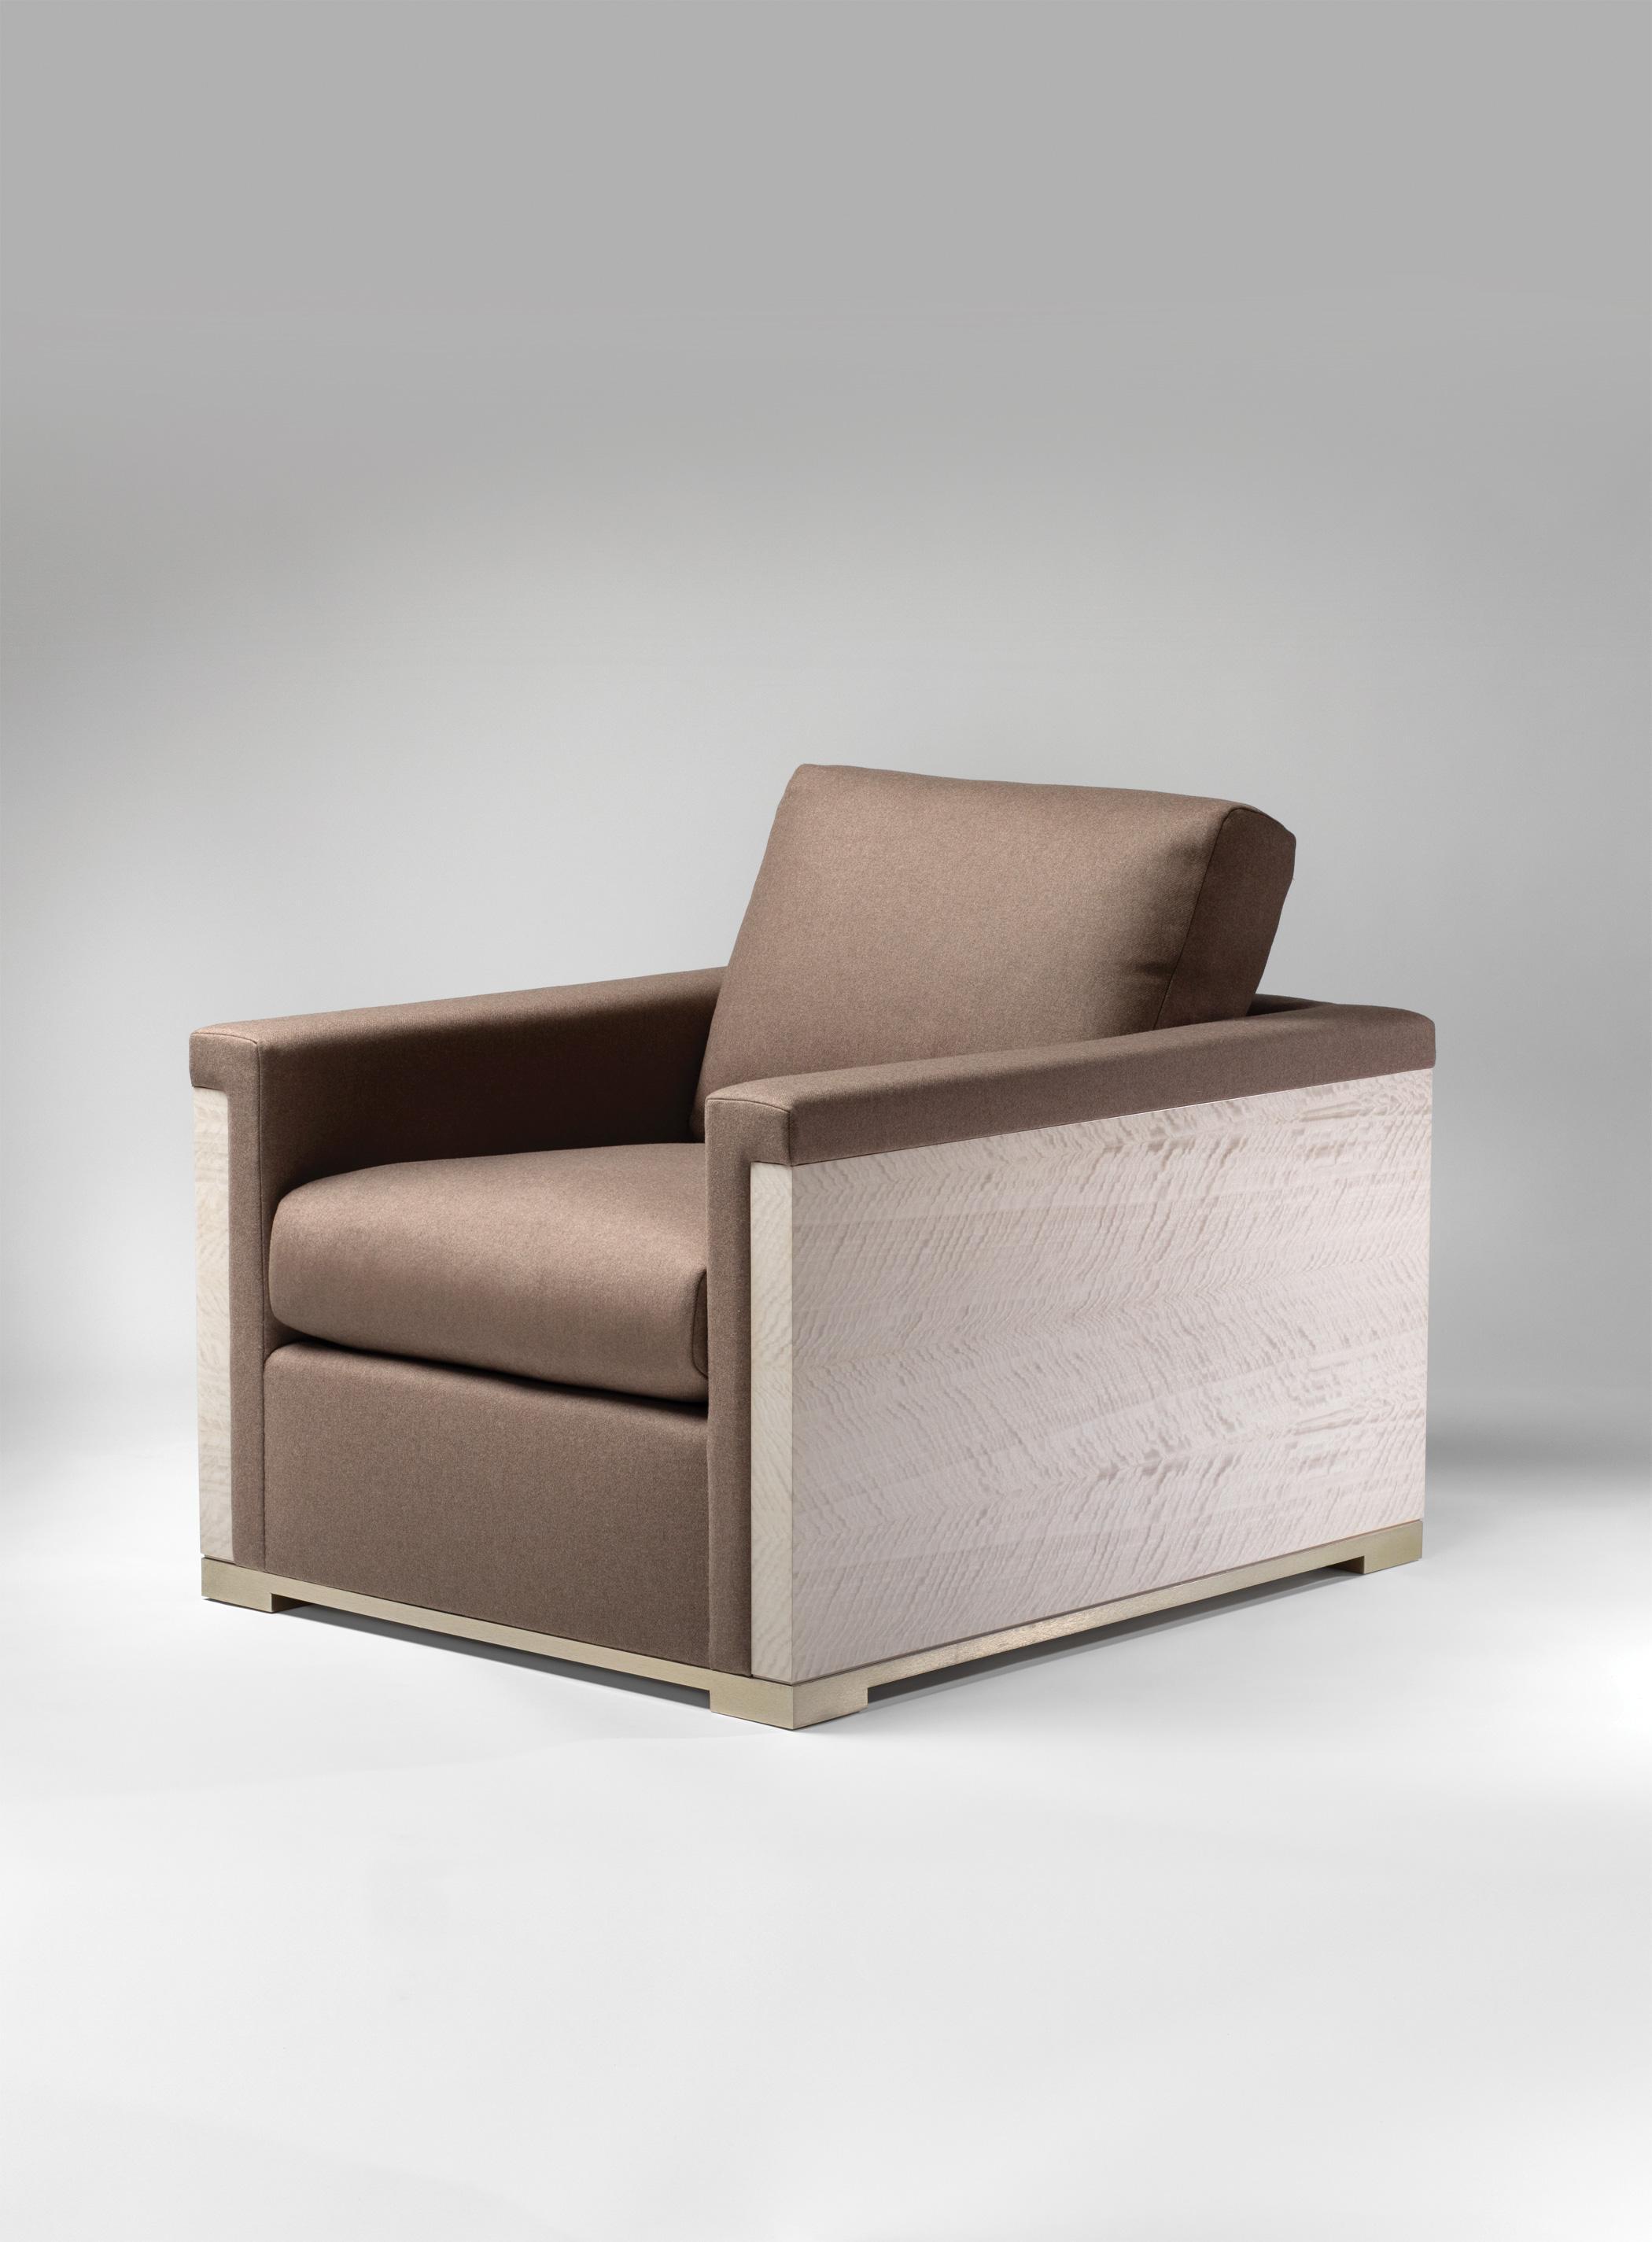 Tramonto Lounge Chair